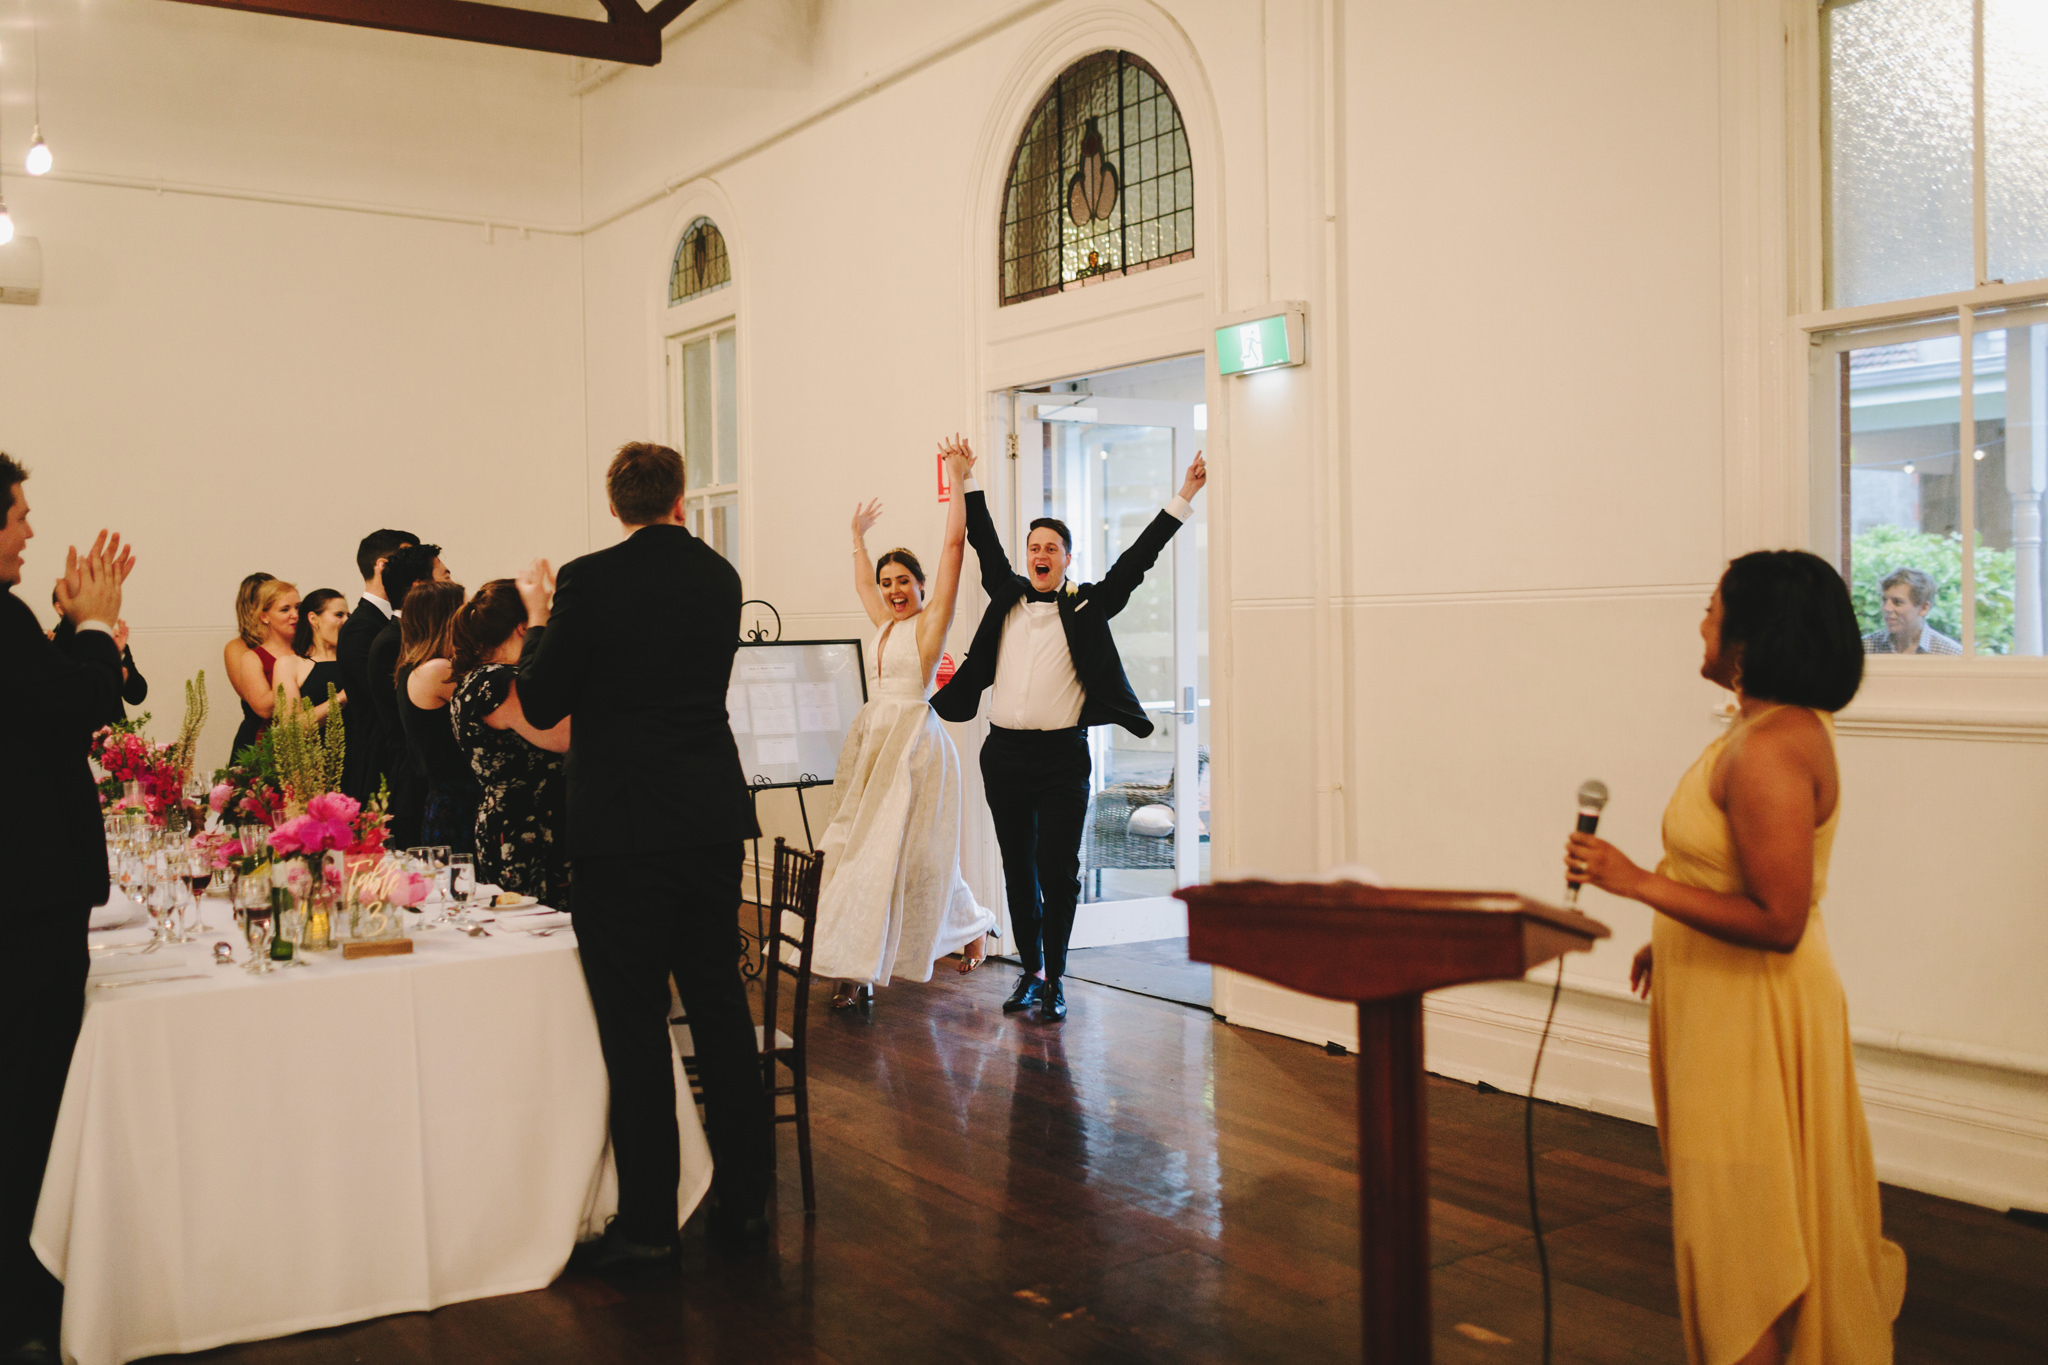 Abbotsford_Convent_Wedding_Peter_Anna097.JPG